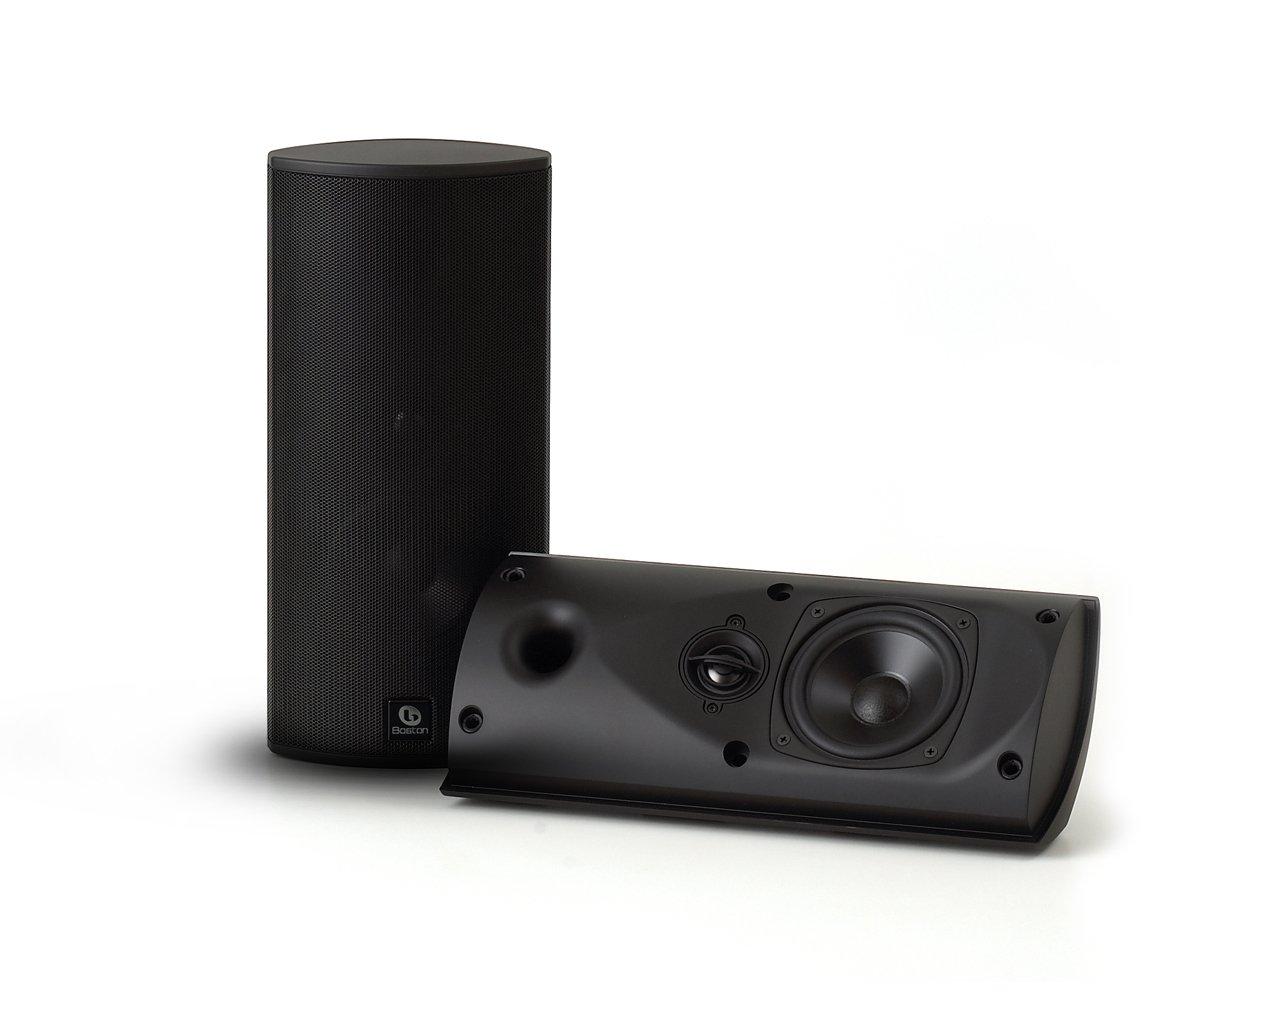 Boston Acoustics Bravo 20 Compact High Performance Loudspeaker - Black